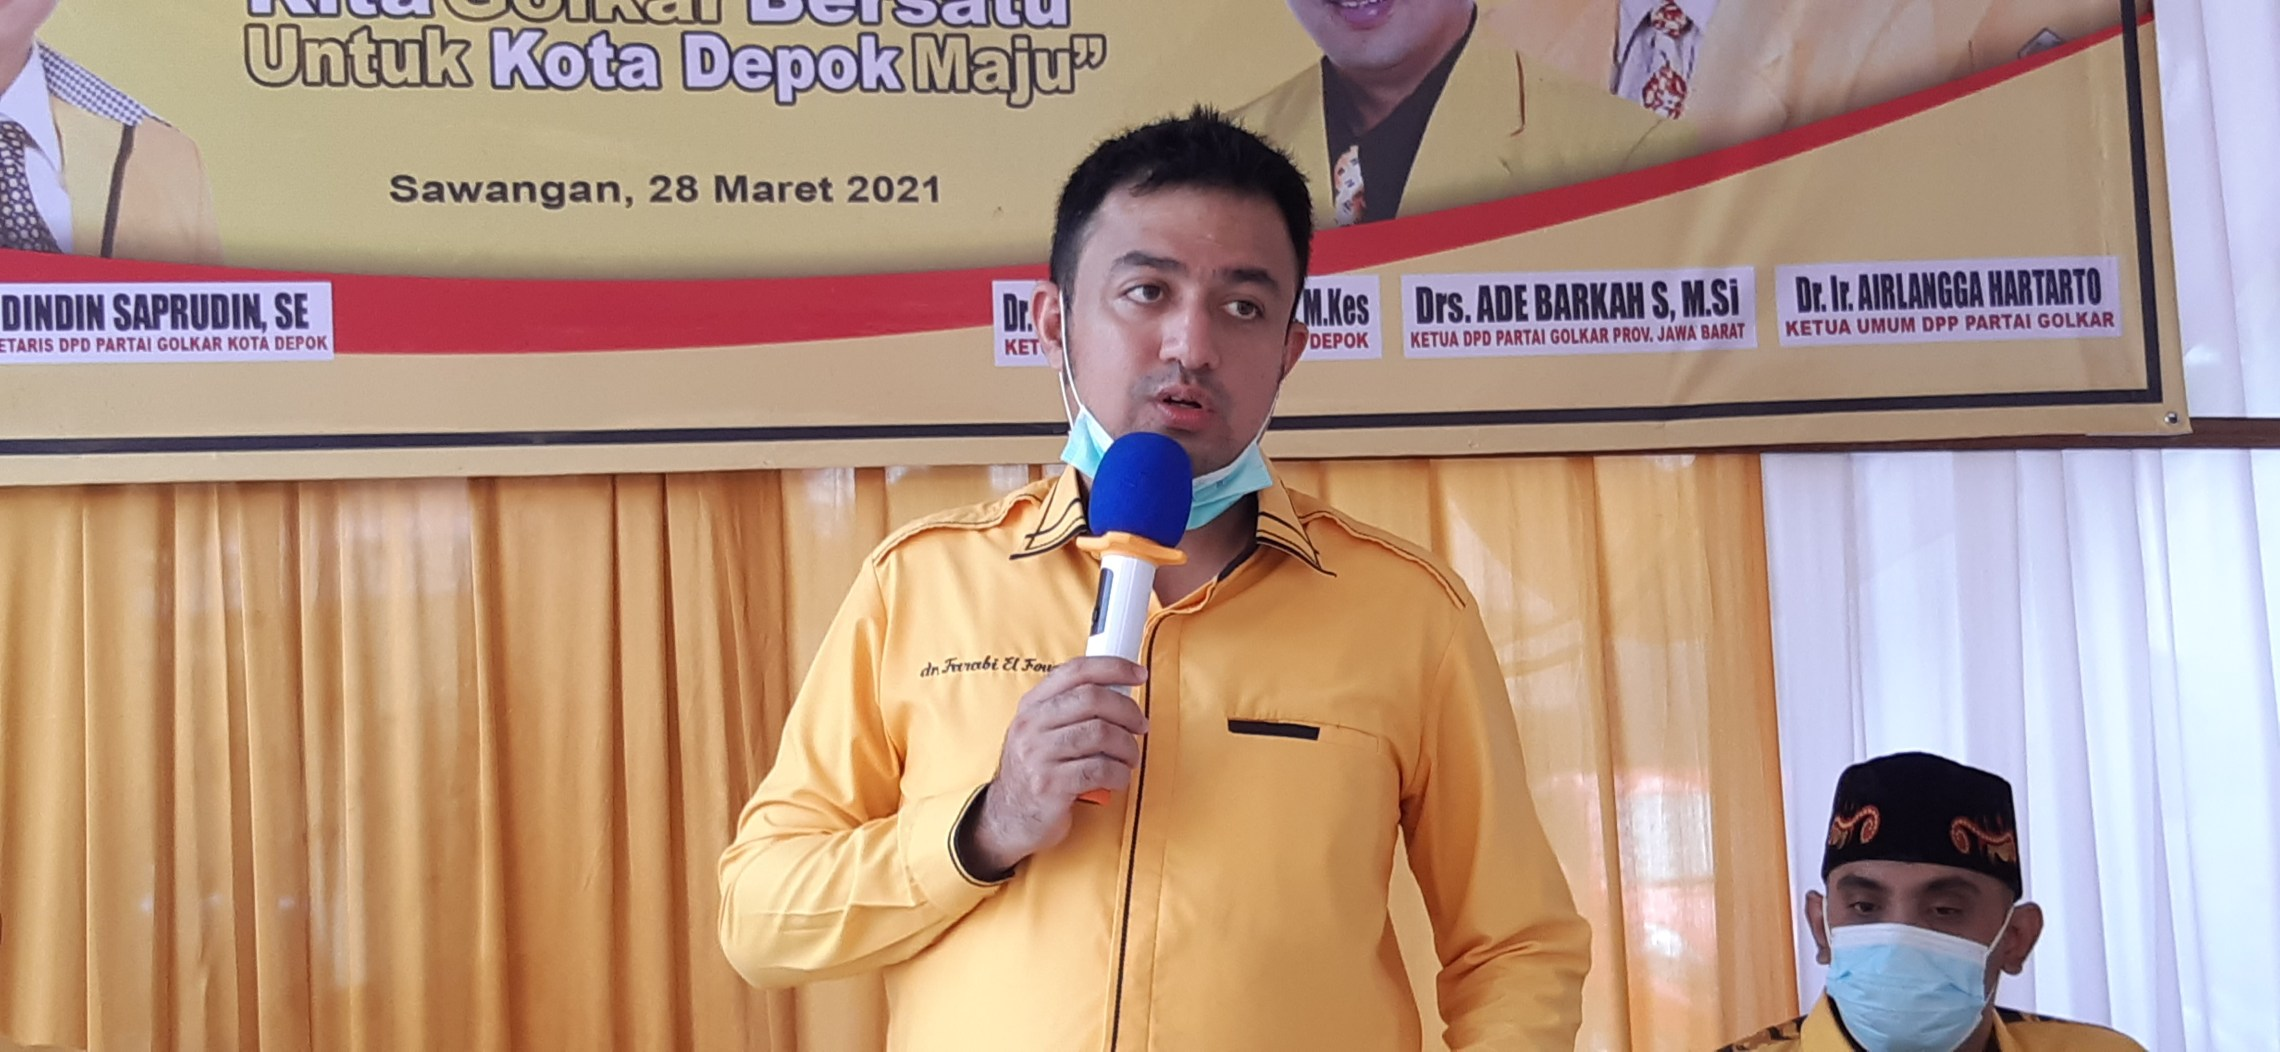 Farabi Arafiq Tegaskan Golkar Kota Depok Dukung Airlangga Hartarto Capres 2024